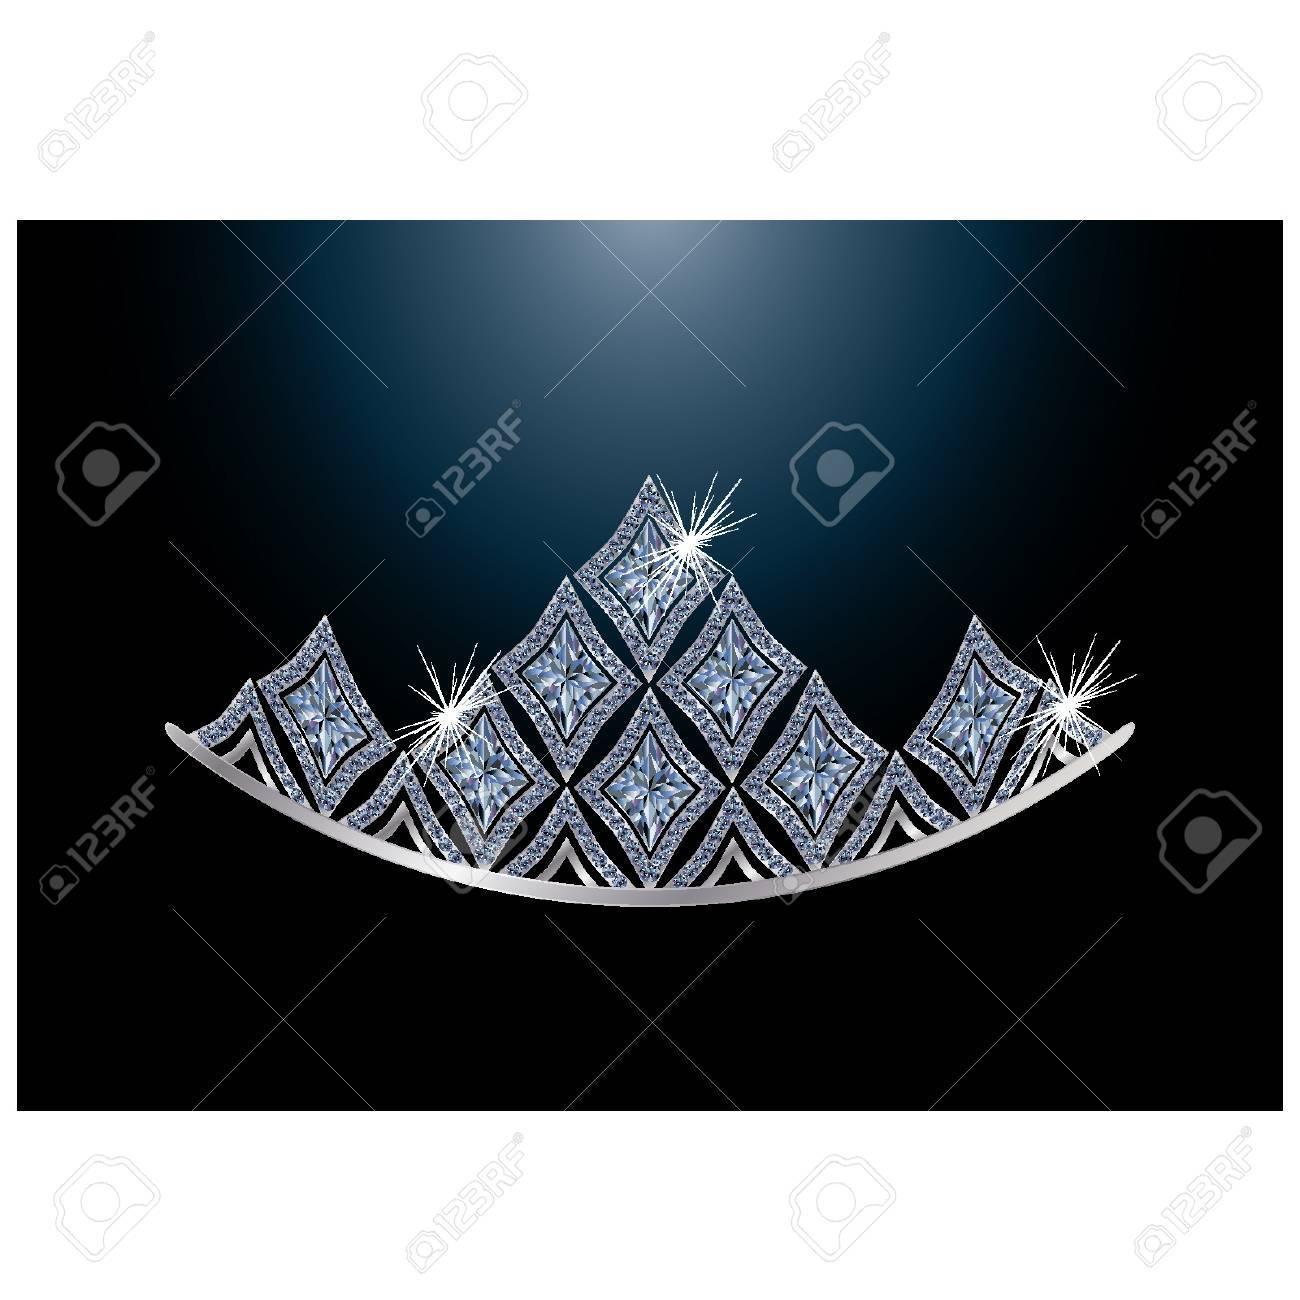 Diamond diadem, vector illustration Stock Vector - 13106772